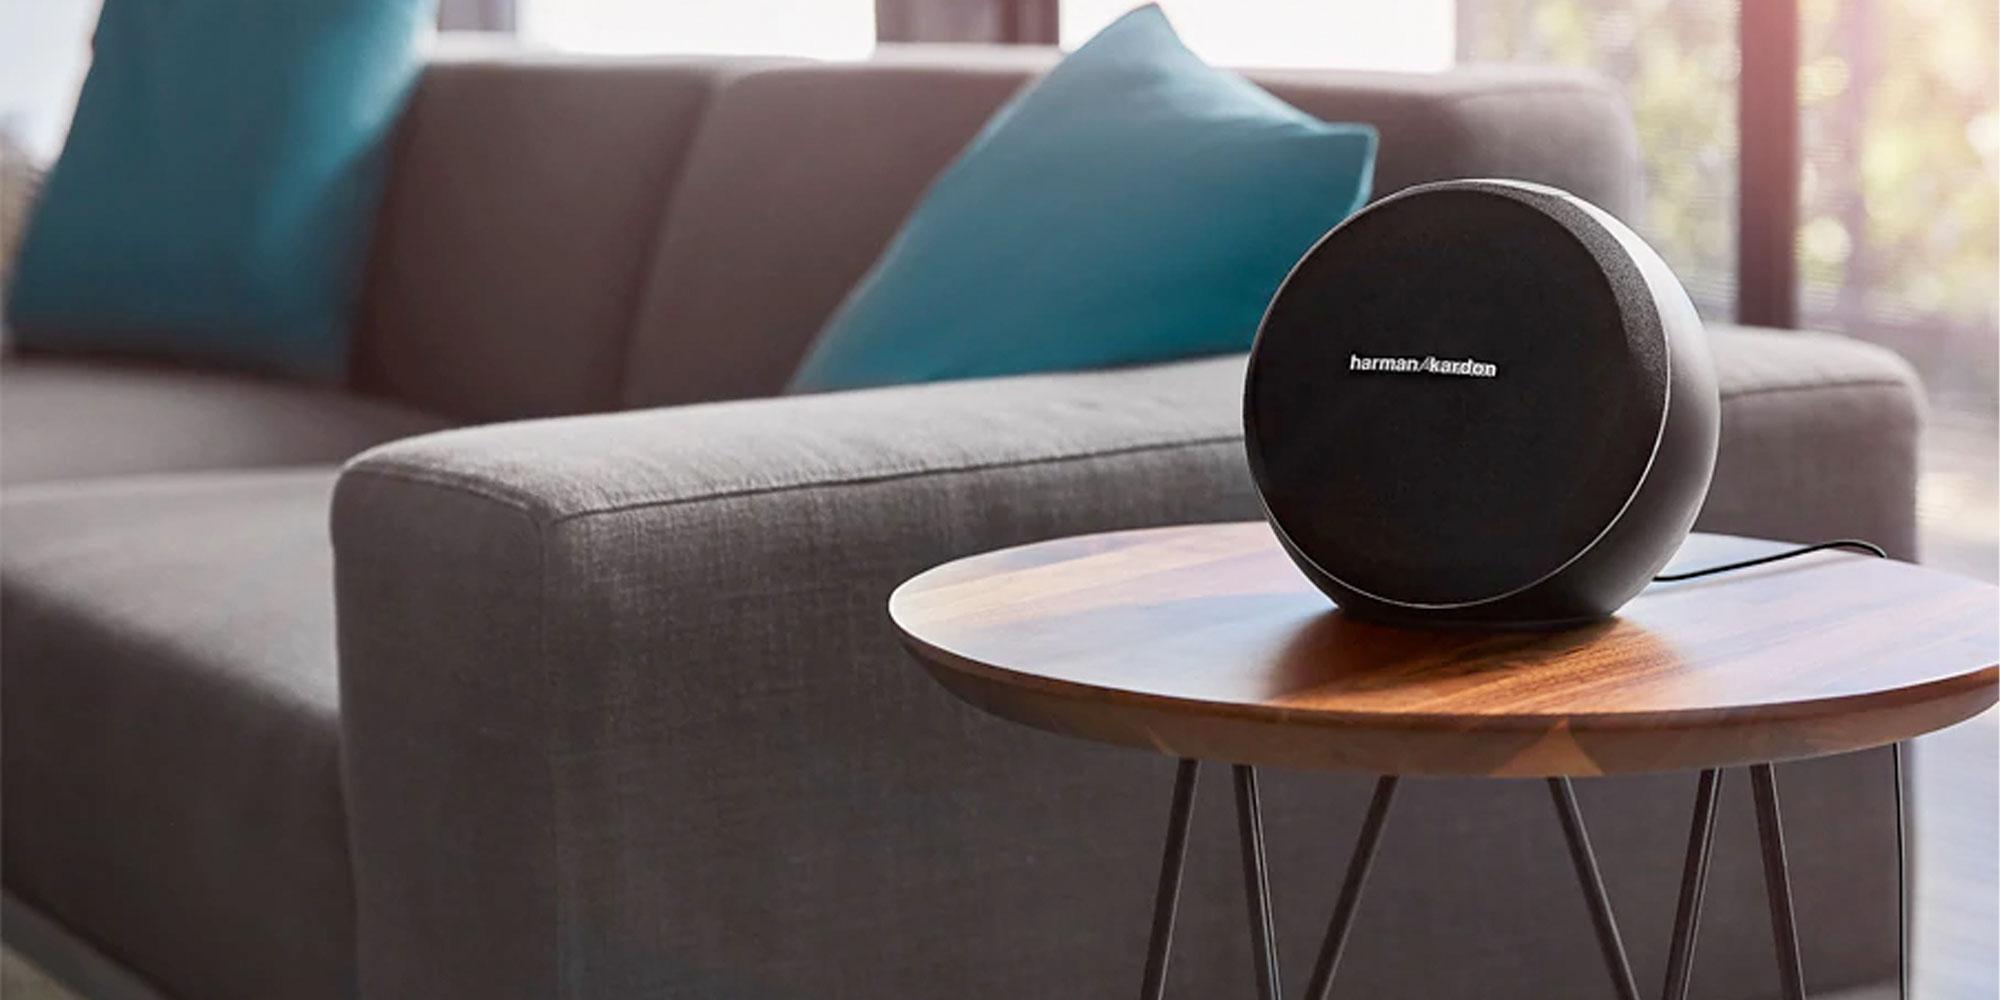 Harman Kardon's Omni 10 Plus Wi-Fi speaker offers Spotify Connect for $60 (Refurb, Orig. $250)